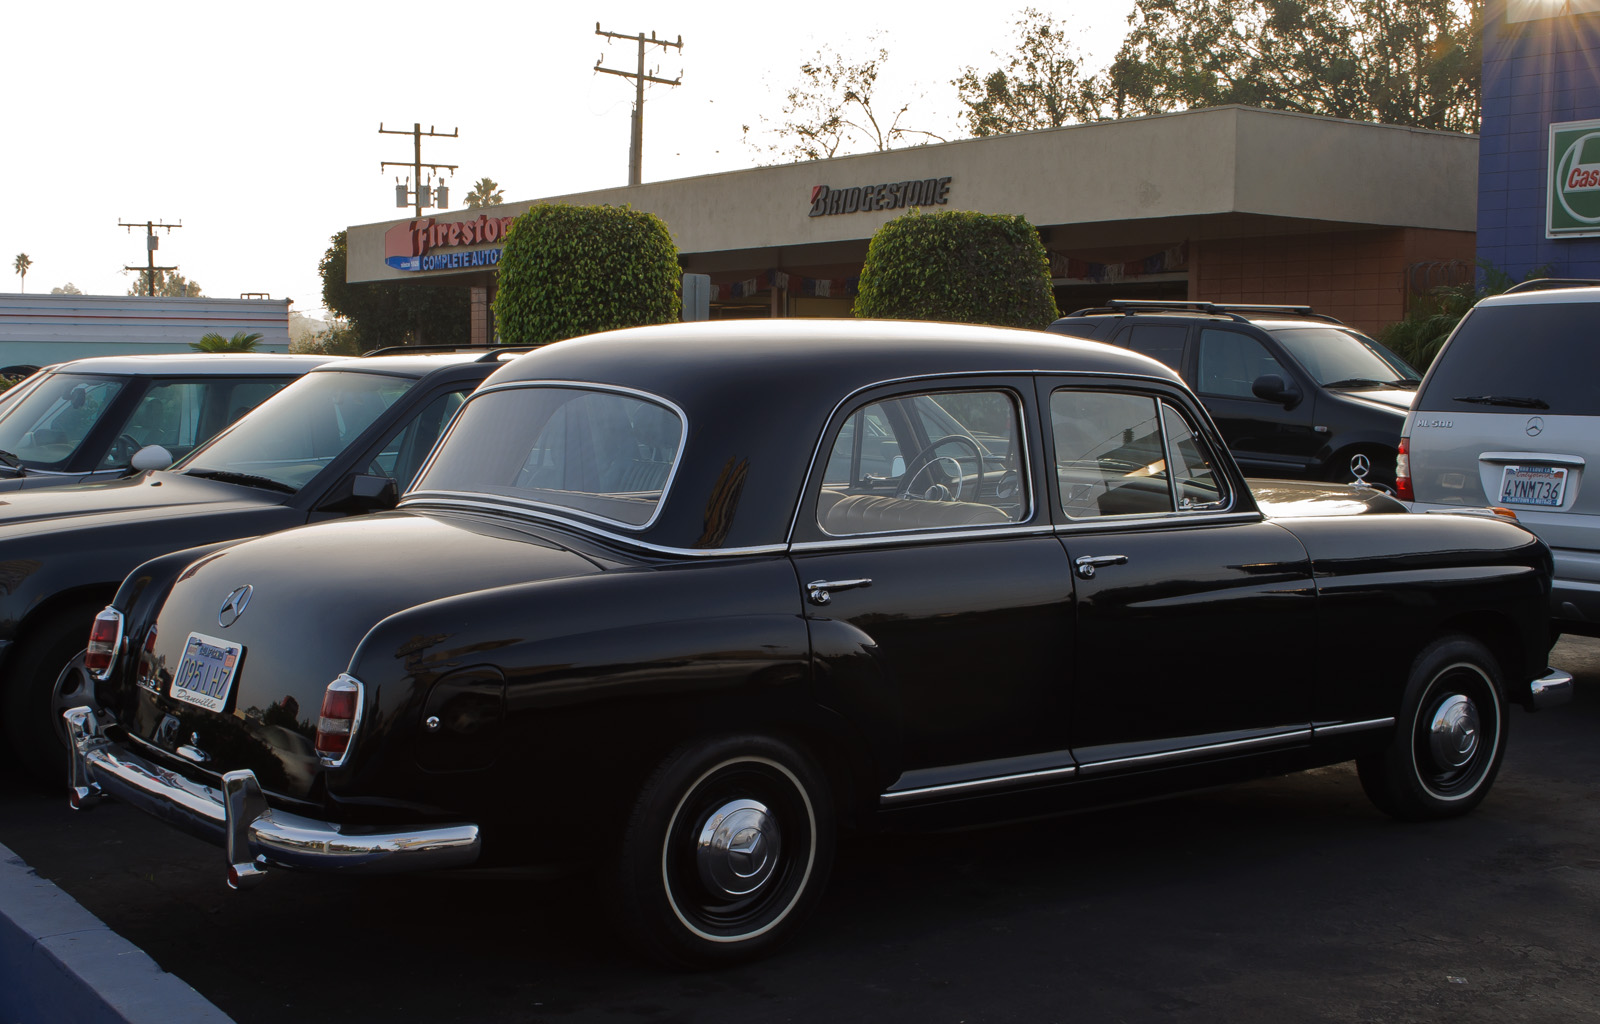 Classy Chassis Car Washes Detailing Lakewood Lakewood Wa